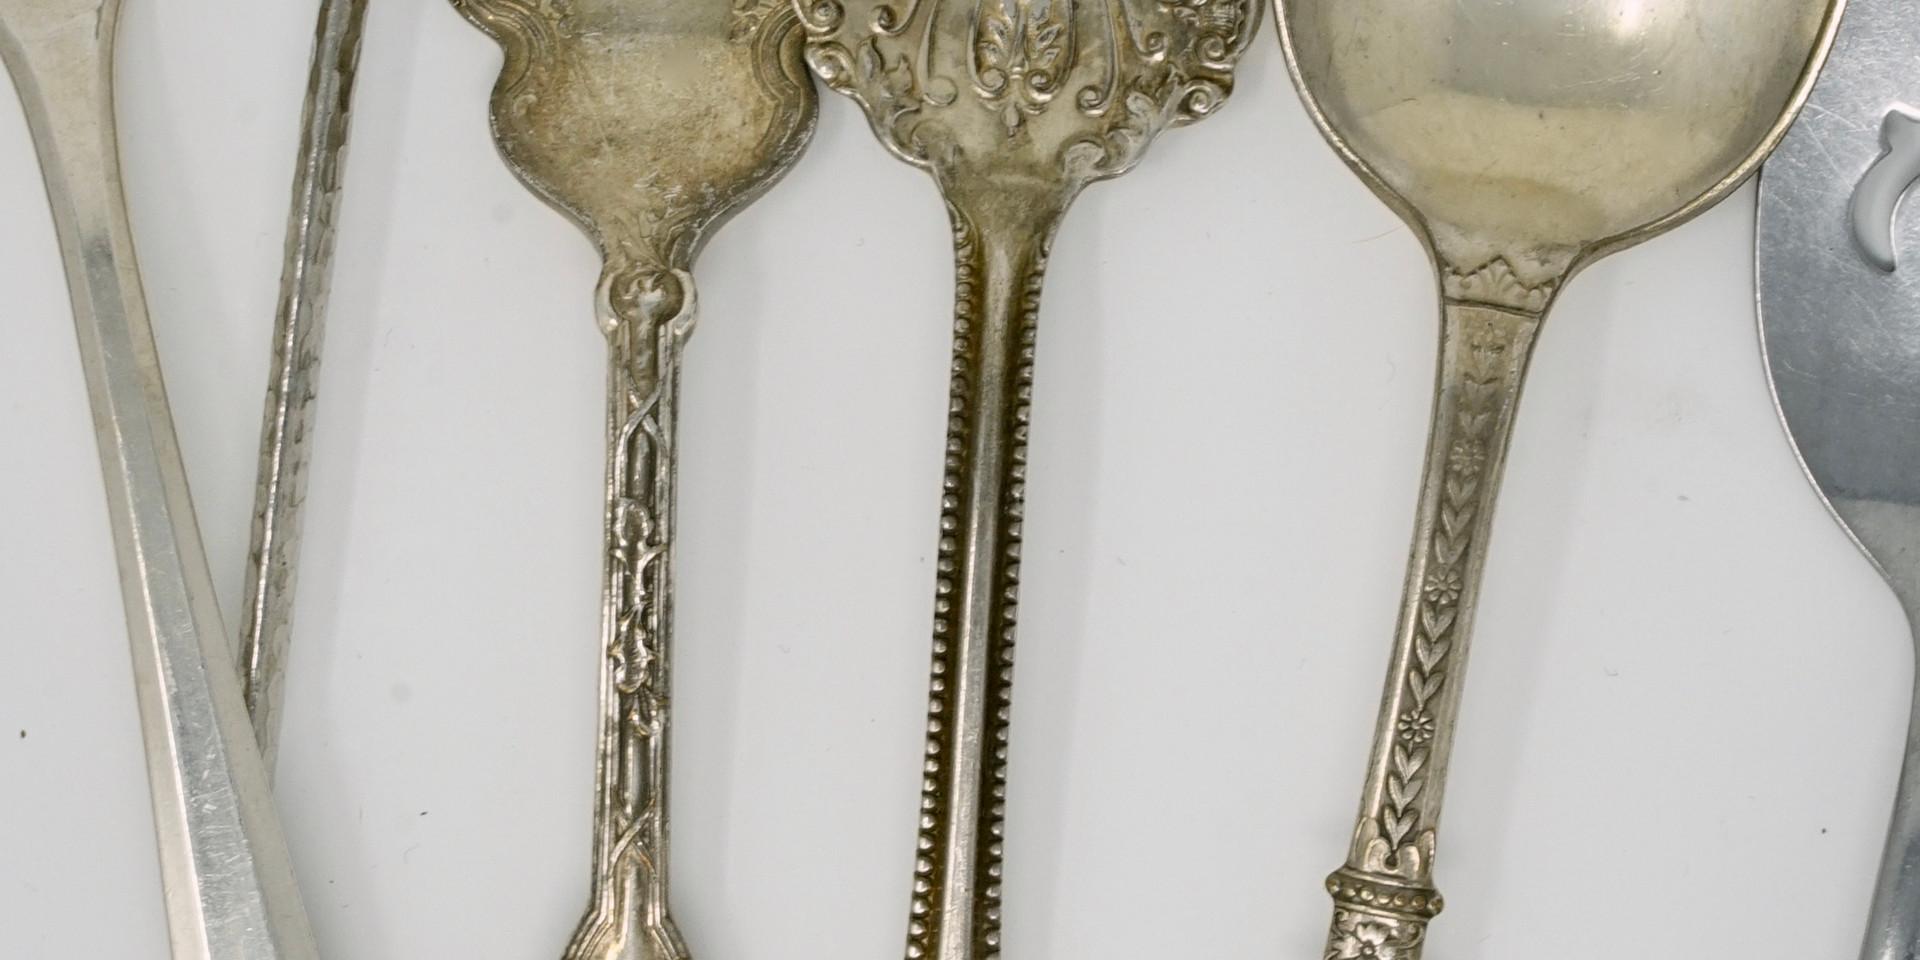 Vintage Mismatched Silverware